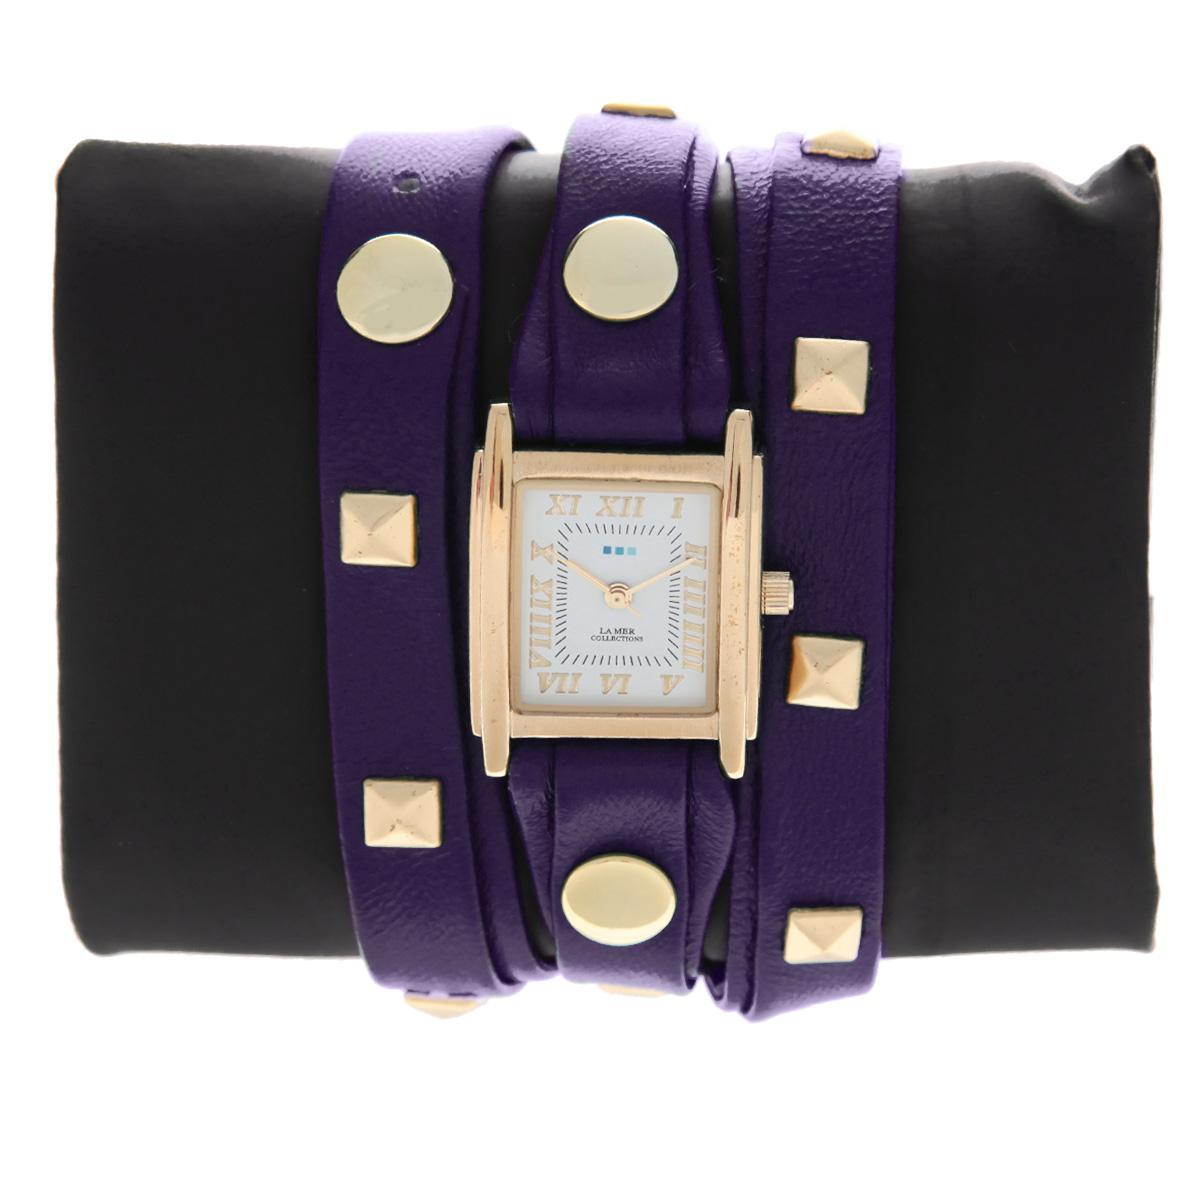 "Часы наручные женские La Mer Collections ""Pyramid Stud Purple"". LMLW1010Hx ( LMLW1010Hx )"